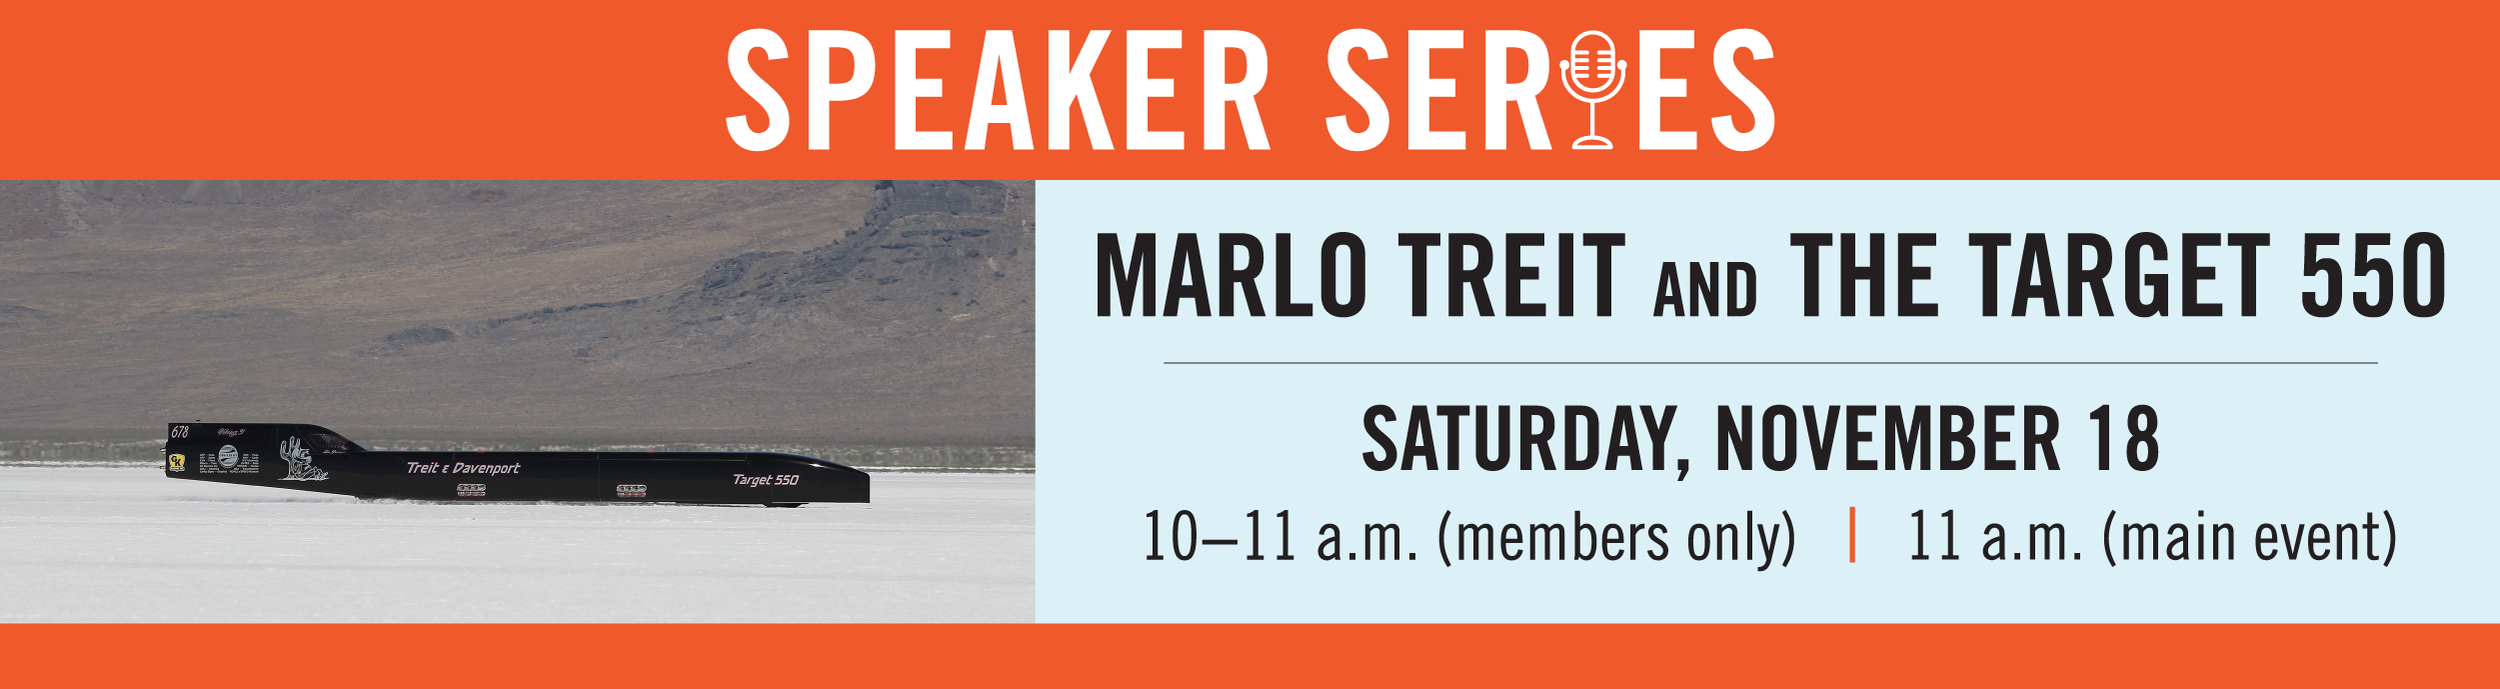 marlo_treit_speaker_event_page-01.png